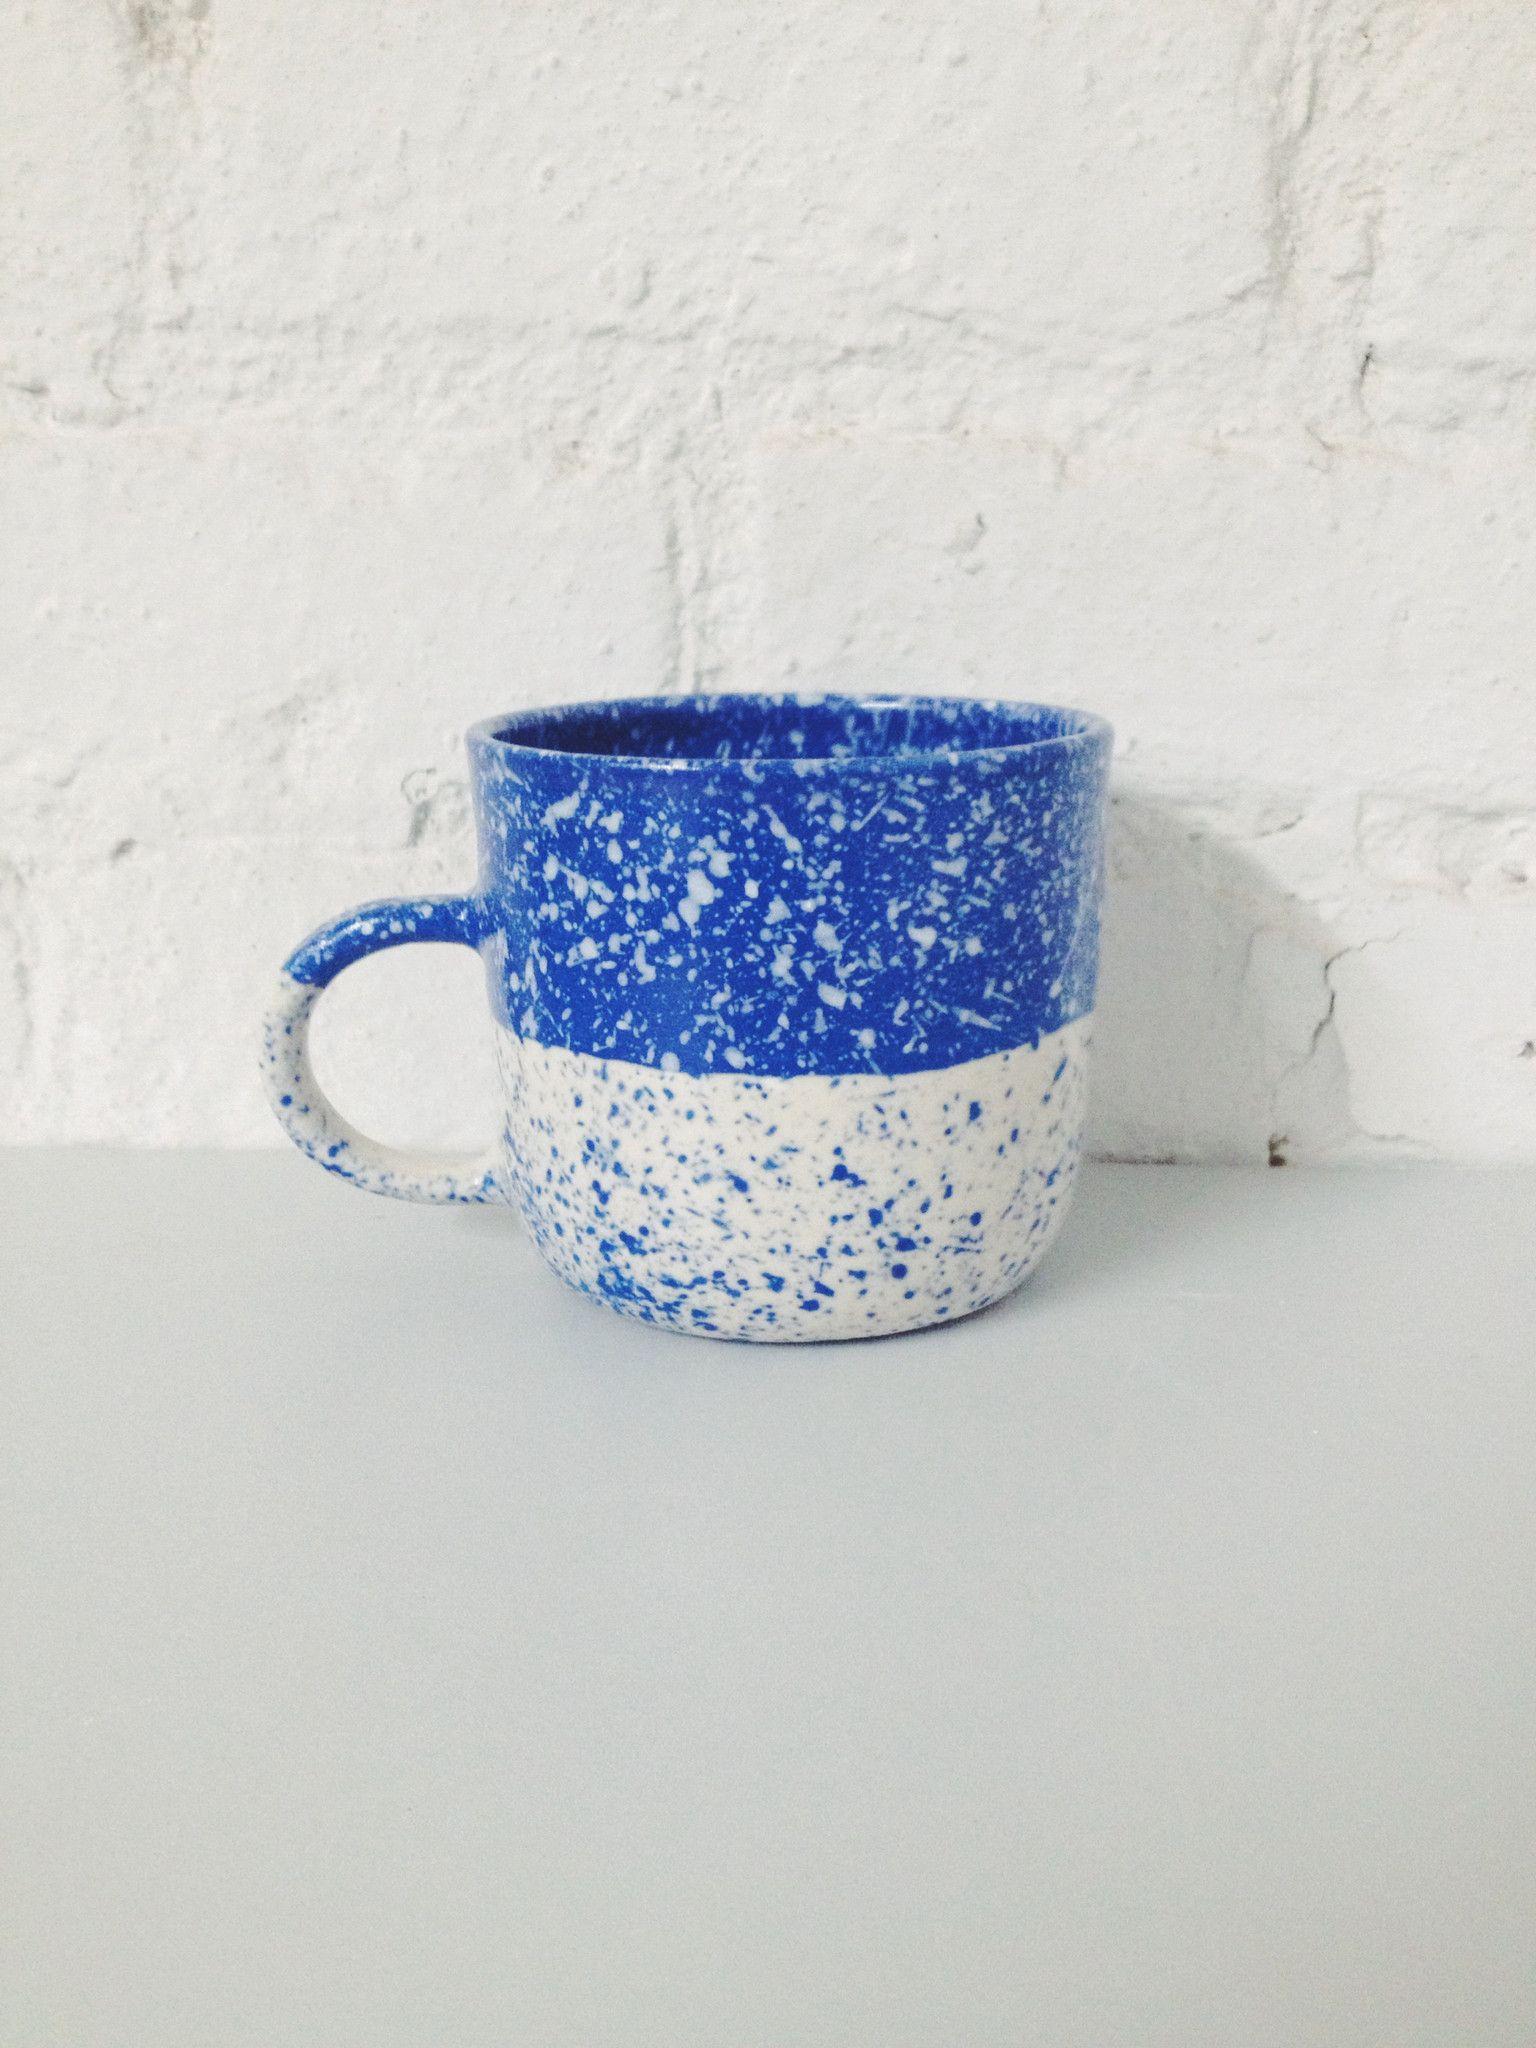 Speckled By Mugs CeramicsSplatter Half Paint Mug Btw Blue xBErCoWQed